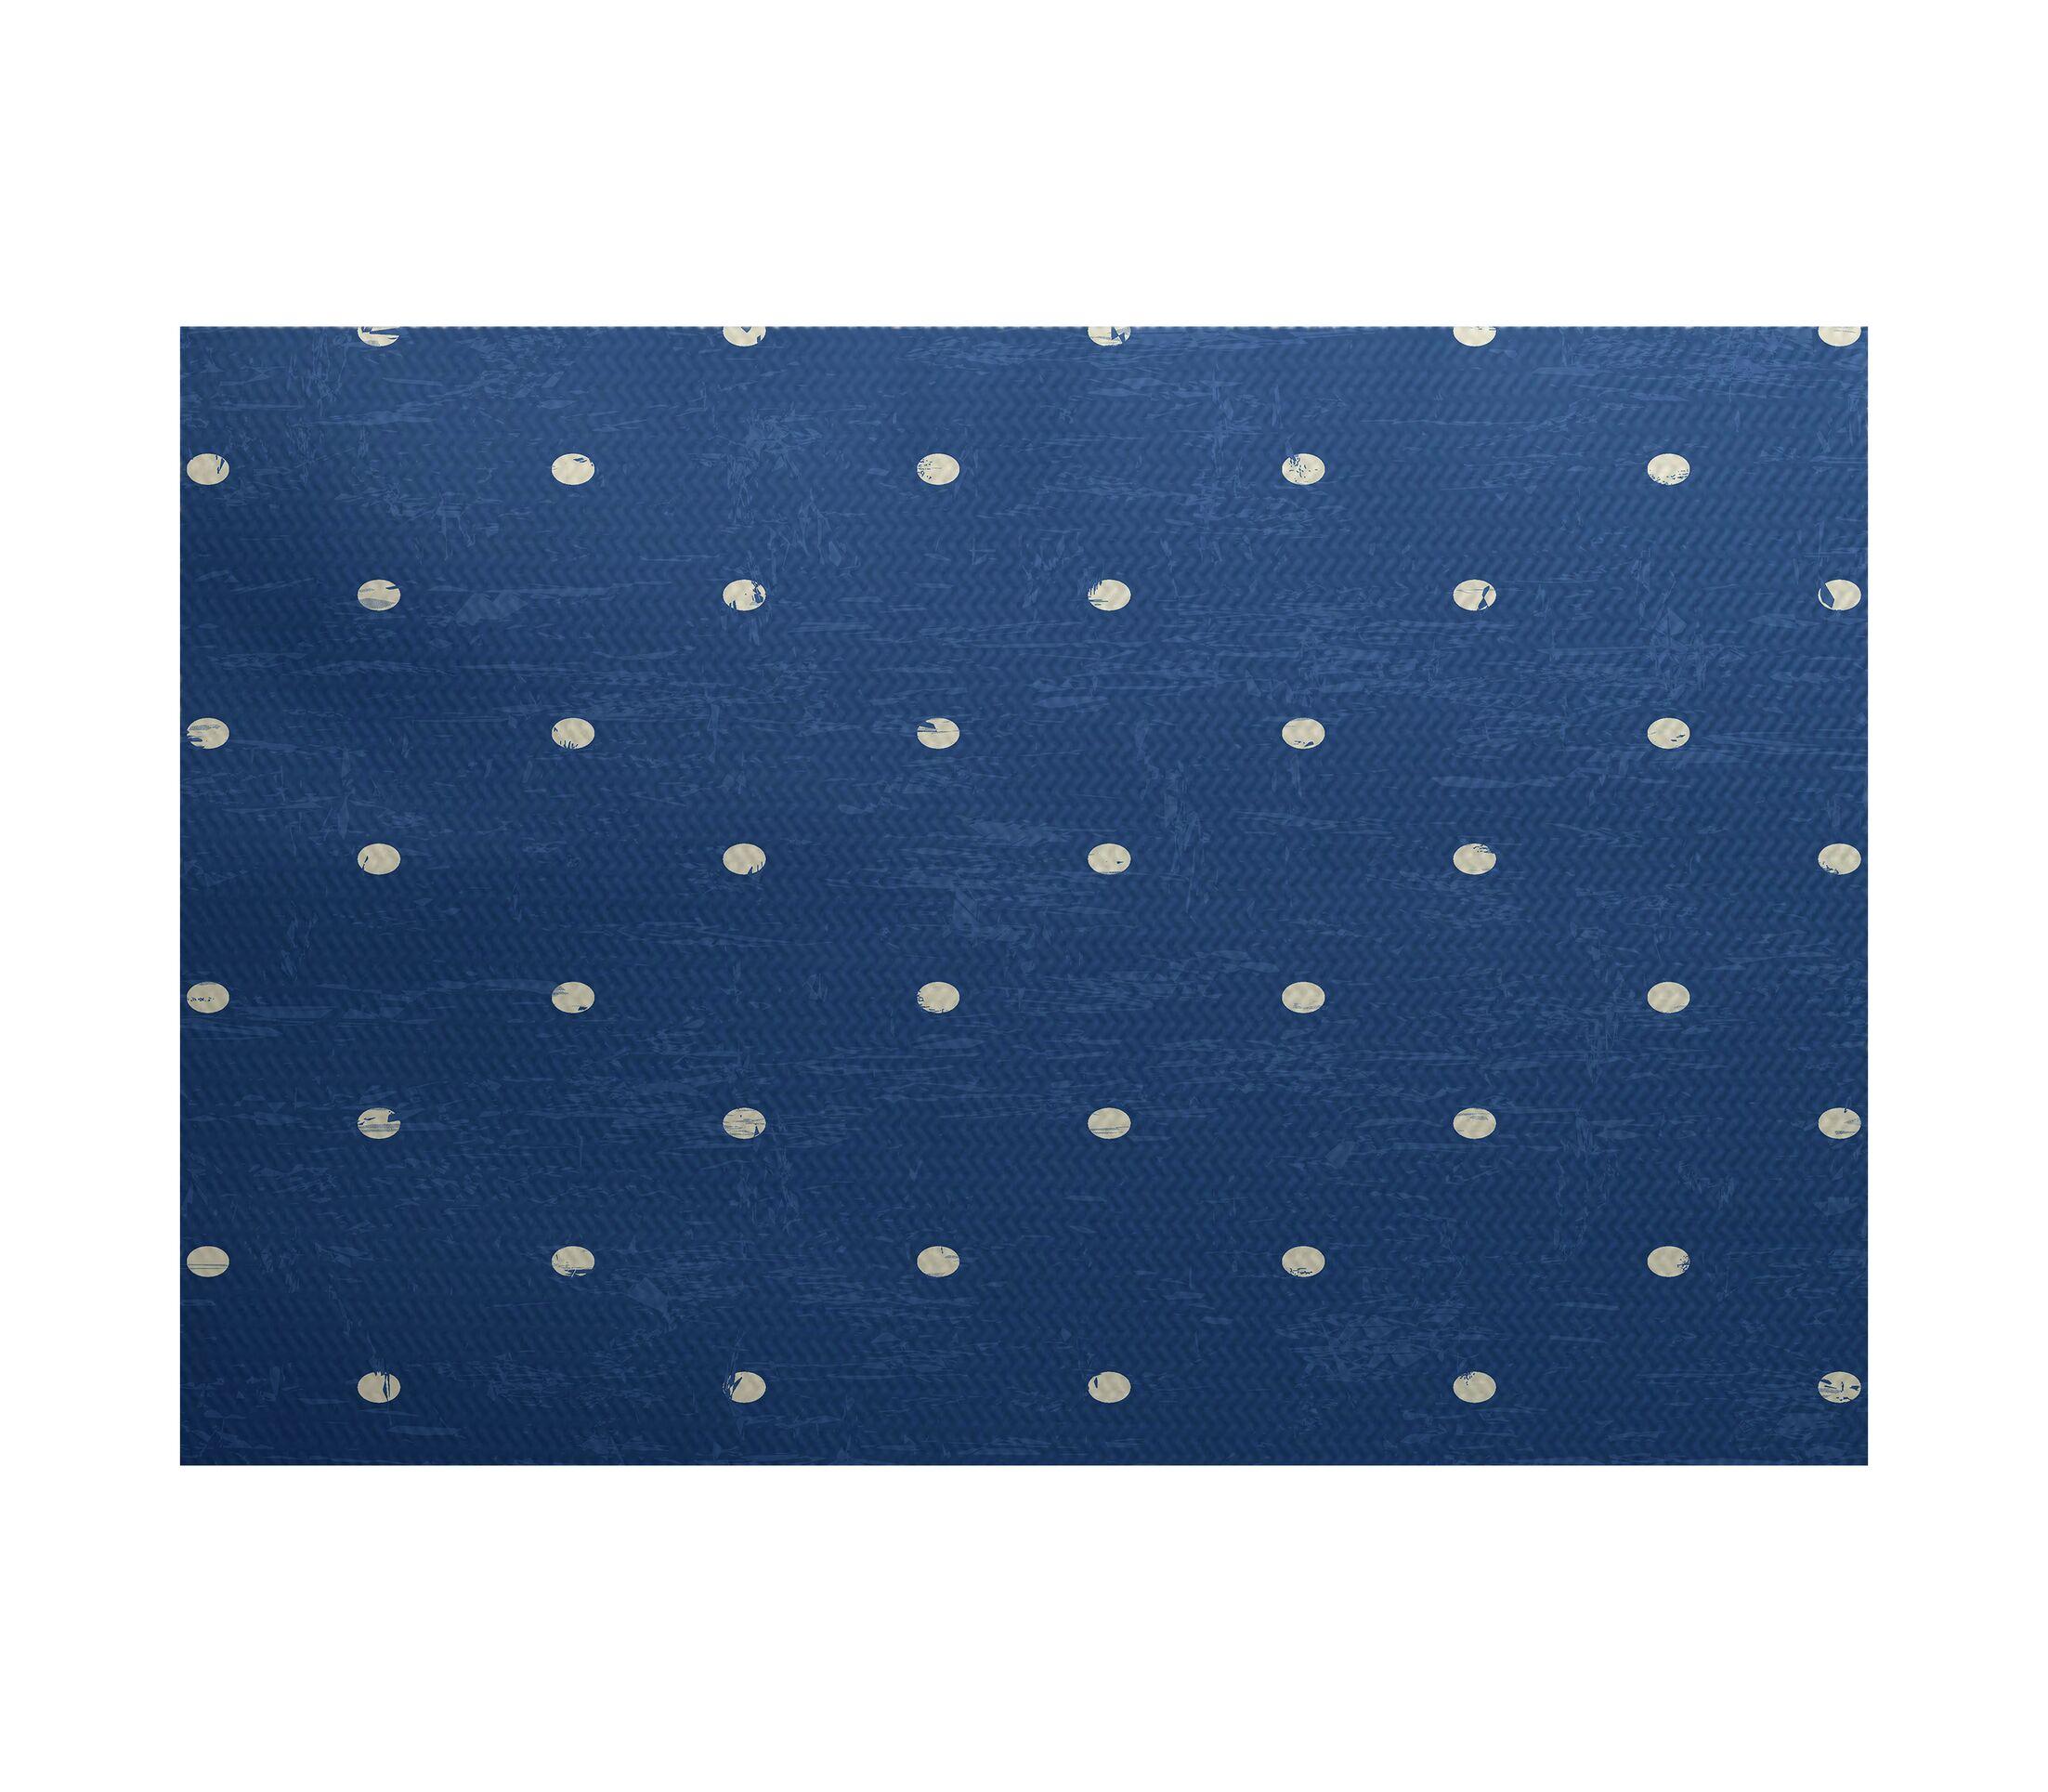 Pembrook Blue Indoor/Outdoor Area Rug Rug Size: Rectangle 3' x 5'